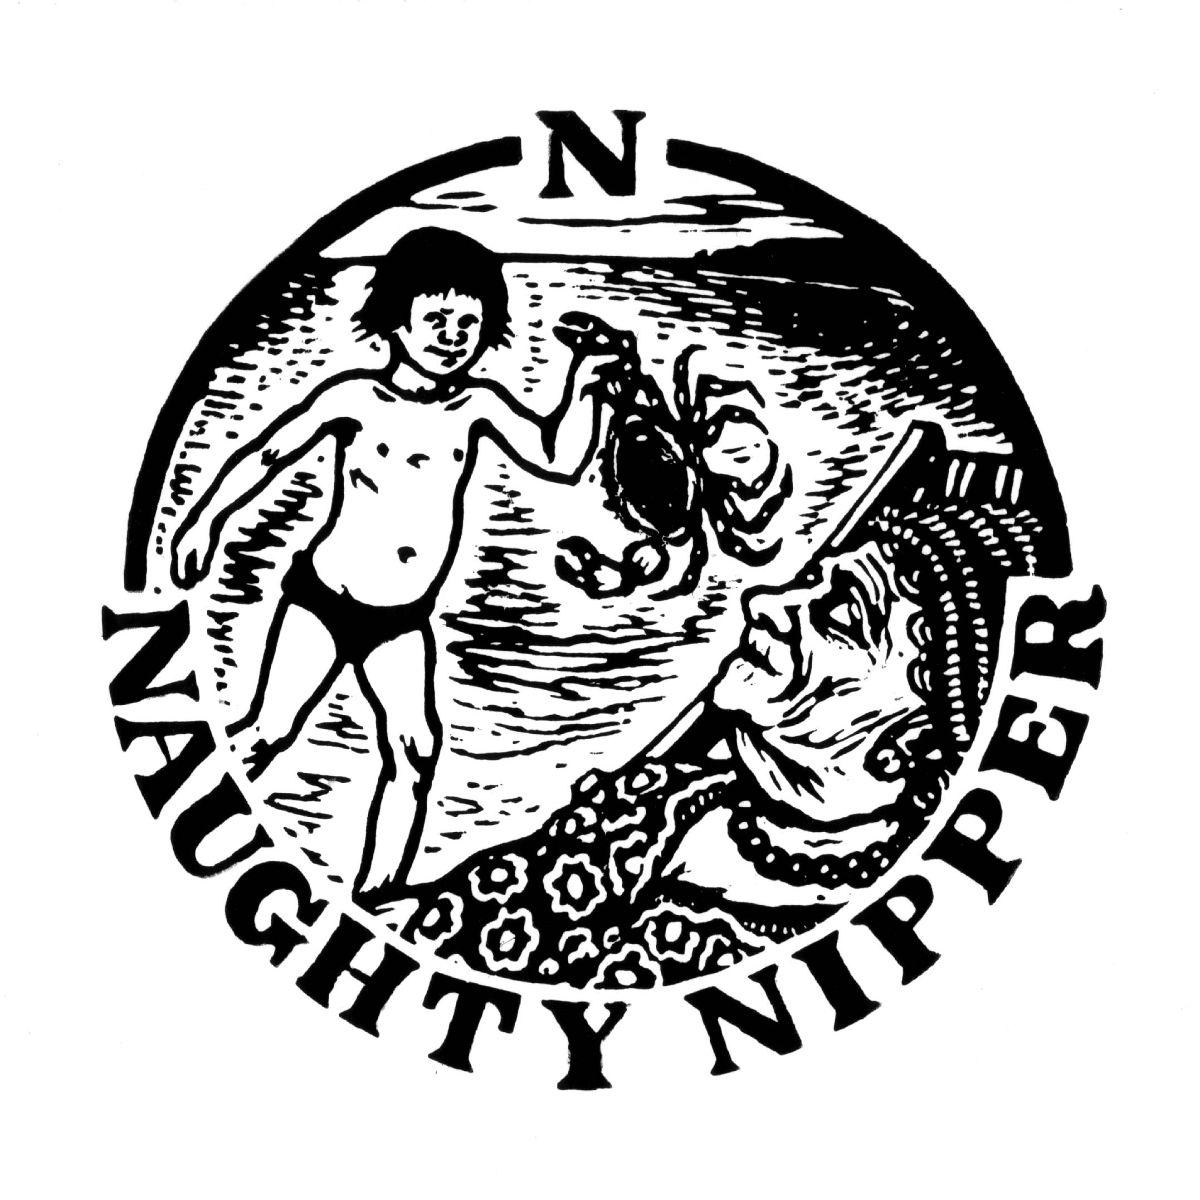 Naughty nipper